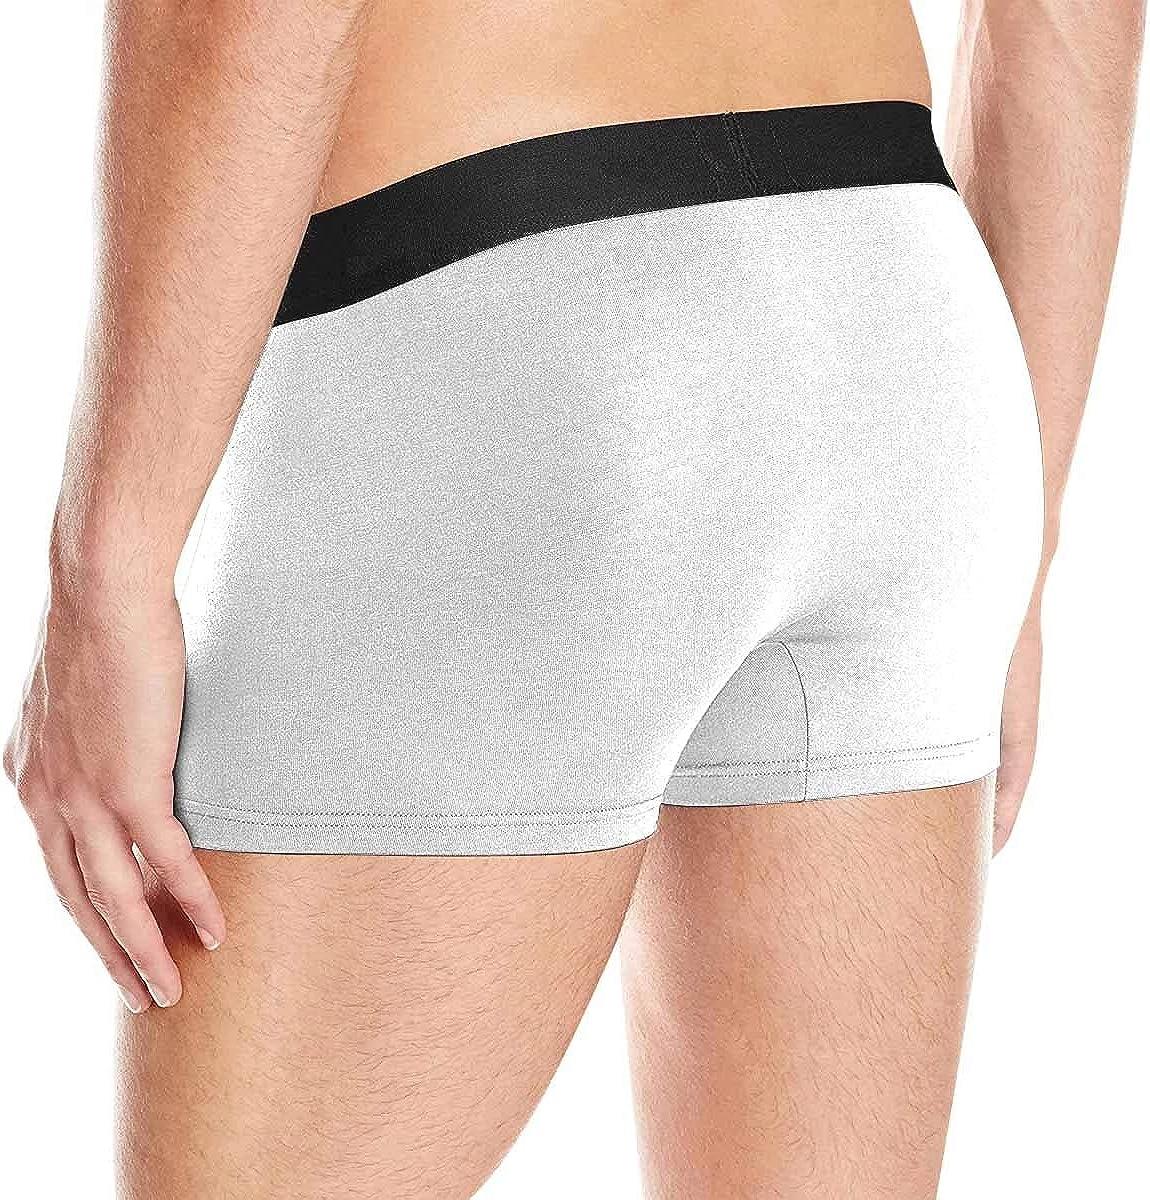 S-XL Custom Men Boxers Funny Face Novelty Underwear Girlfriend or Wife Hug Print Briefs Photo for Men